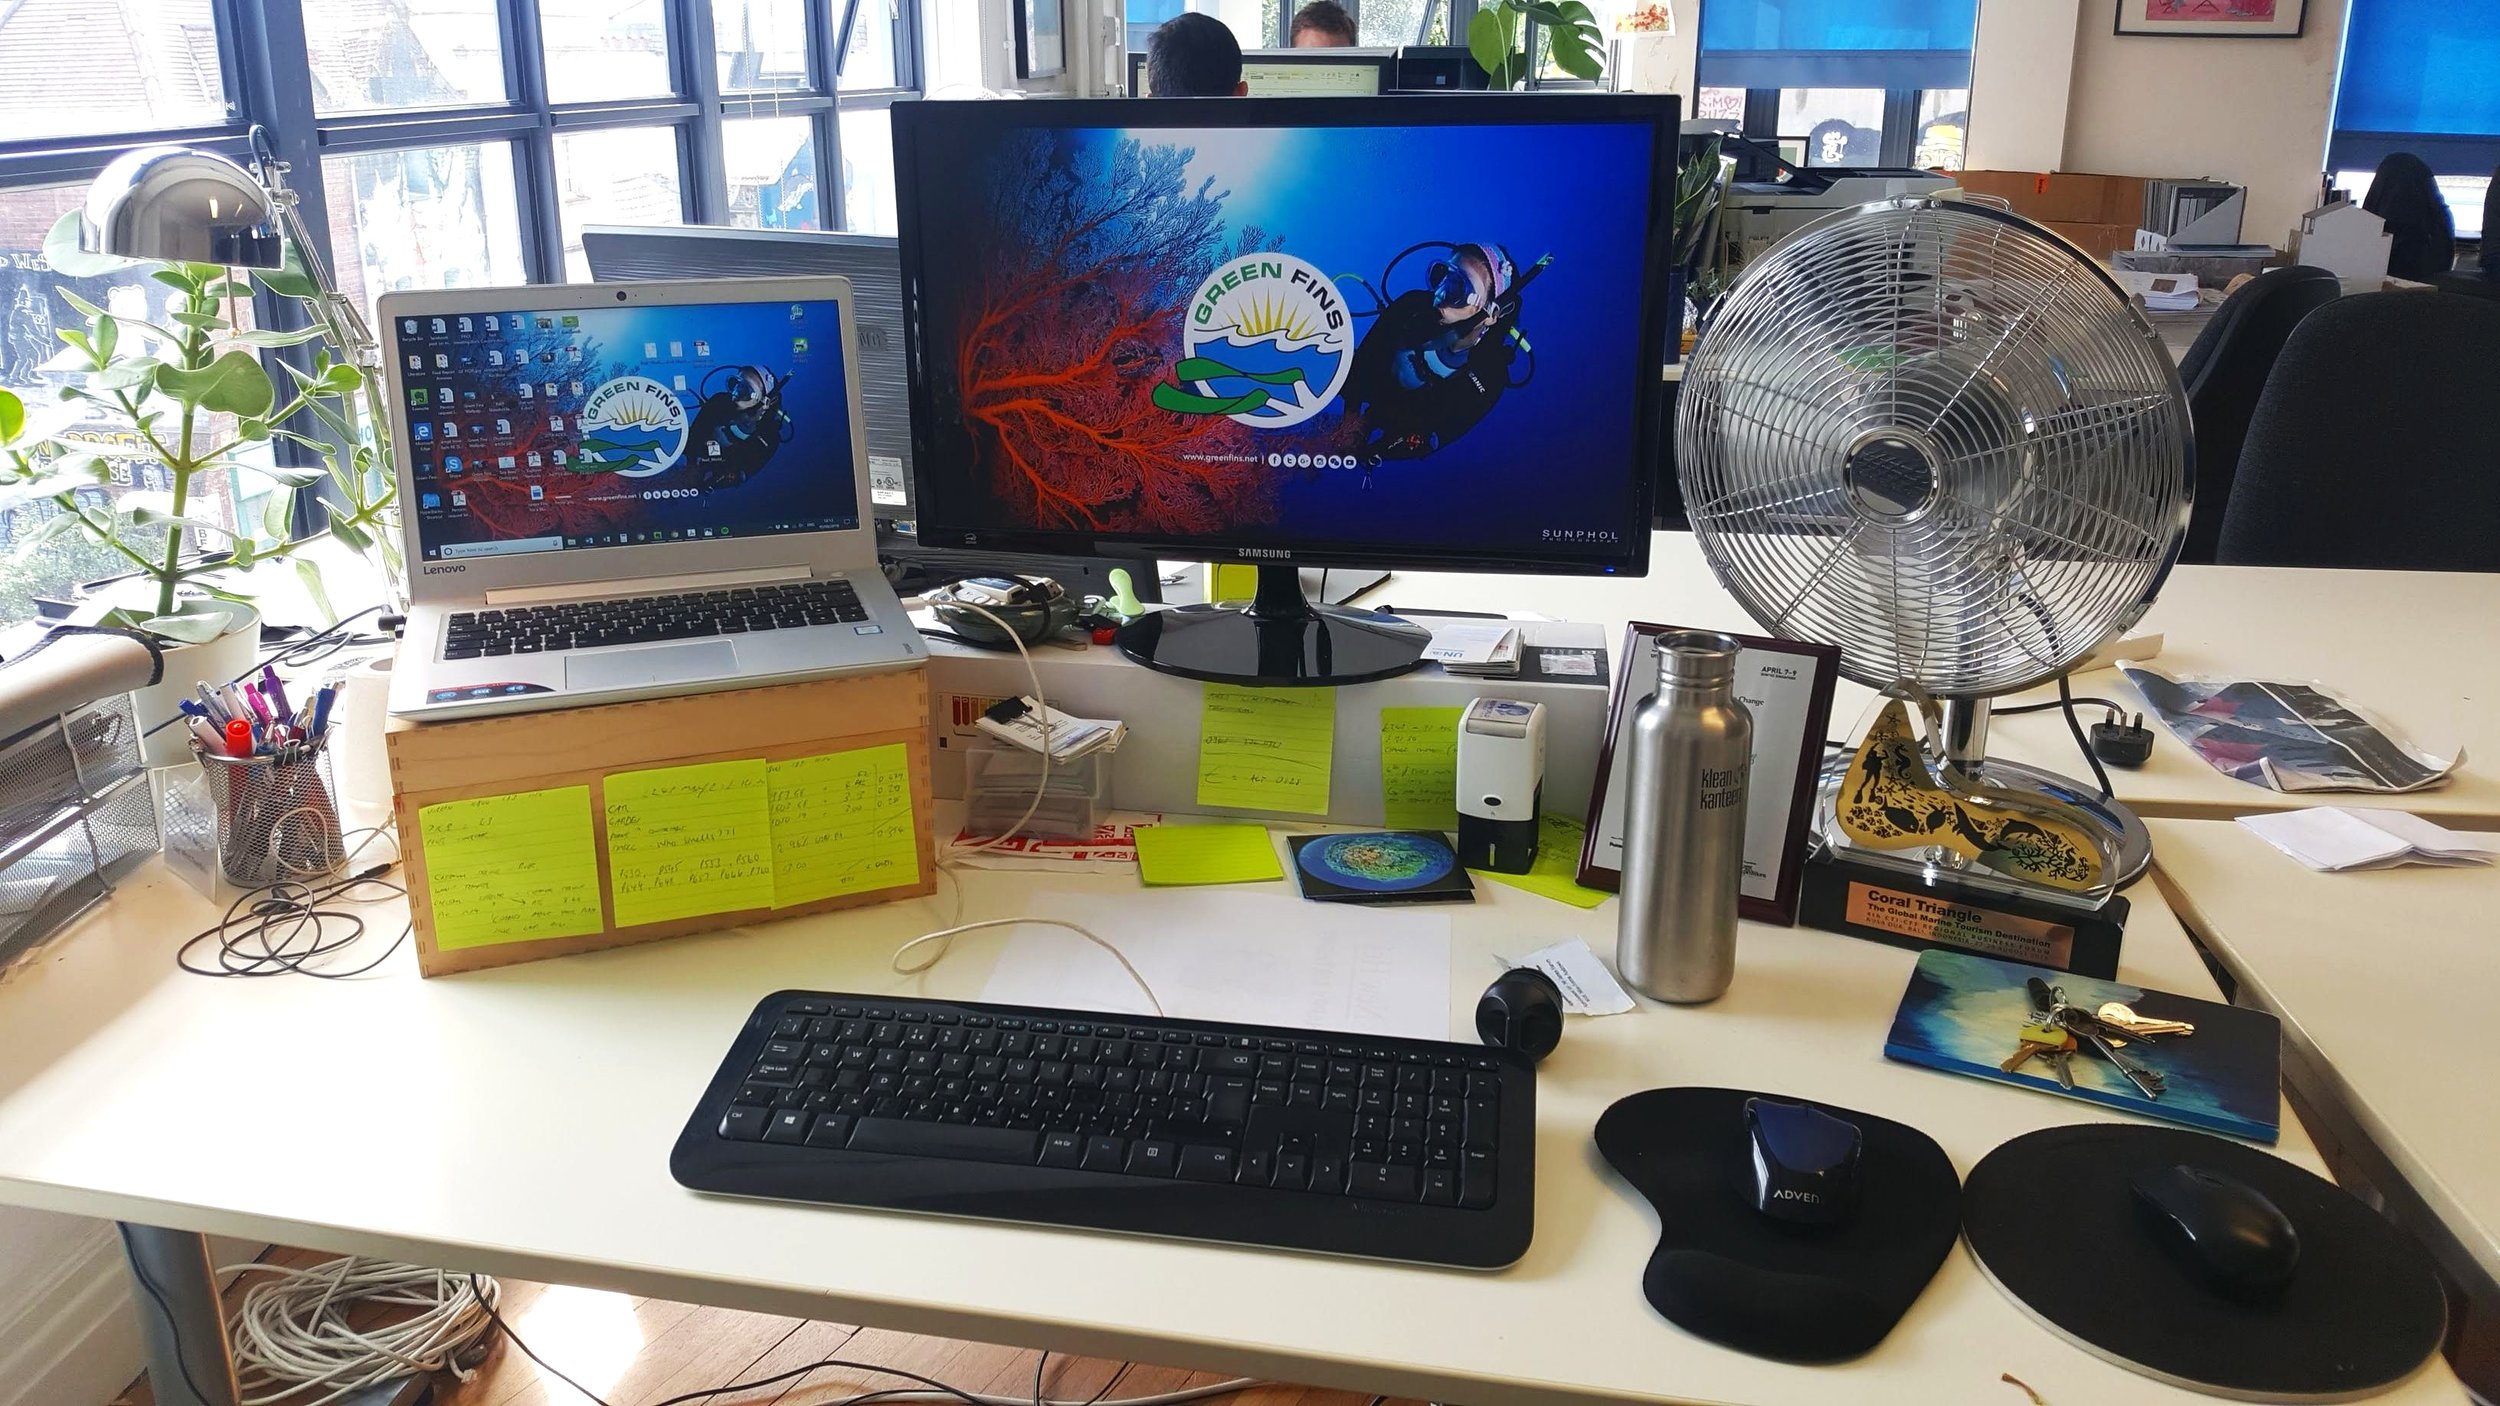 The desk.. inspiring stuff!